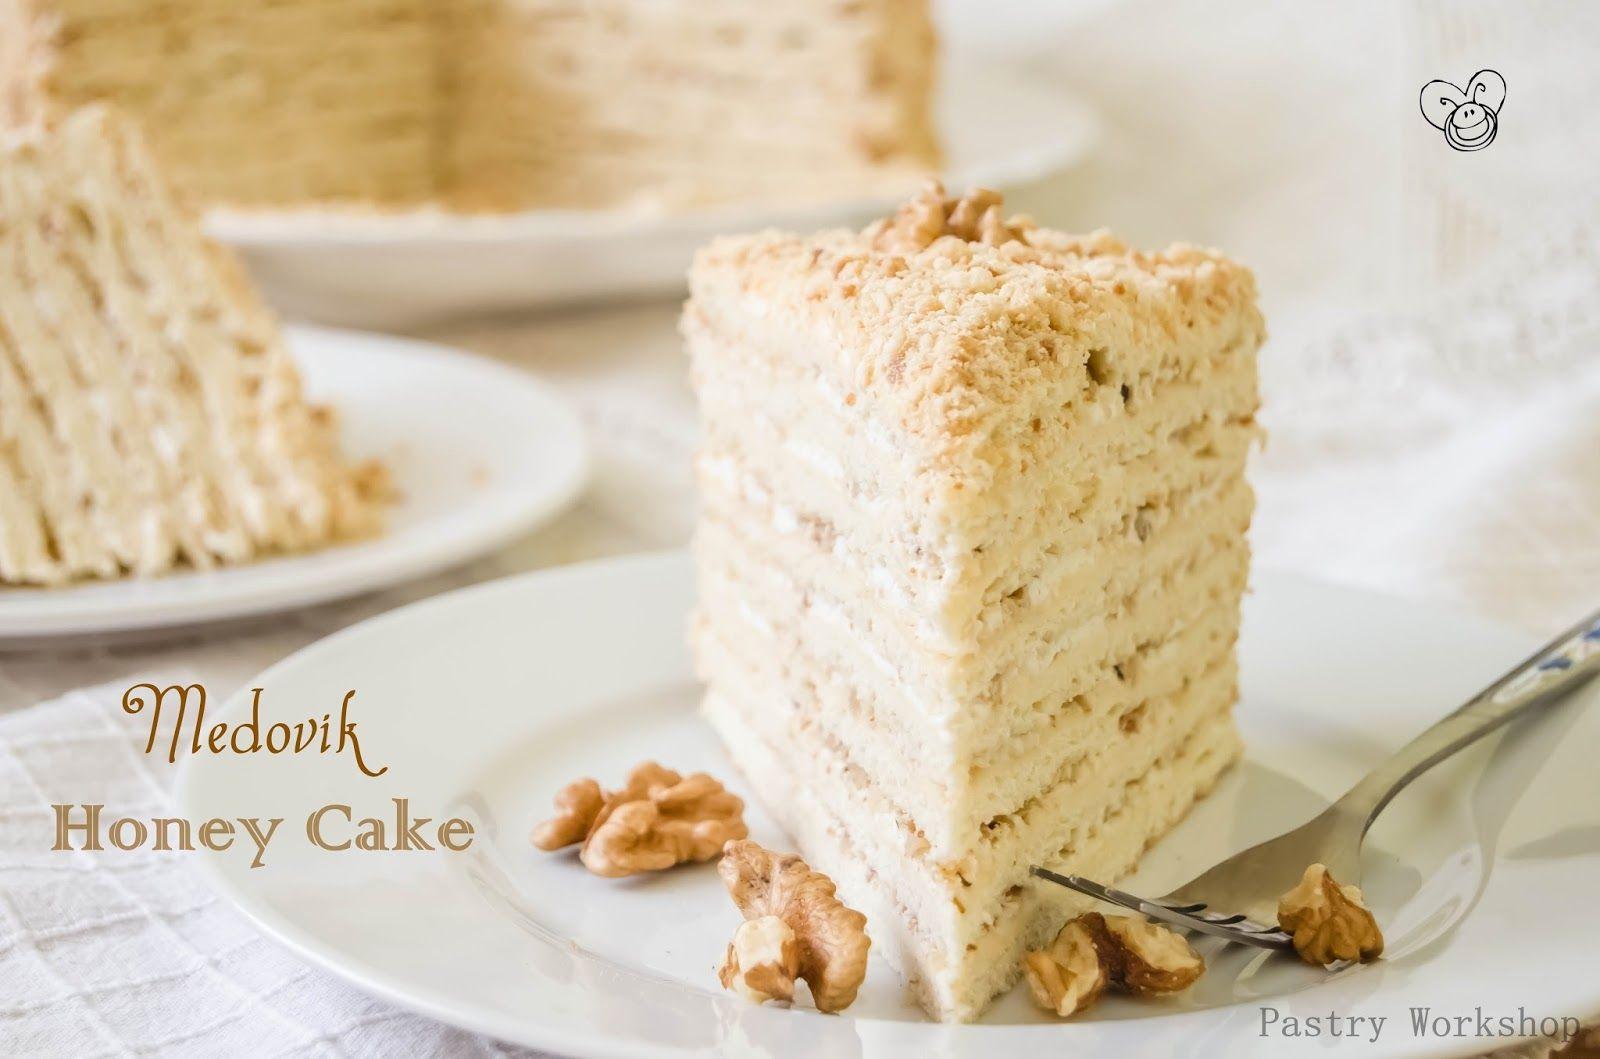 Medovik Cake - Honey Cake